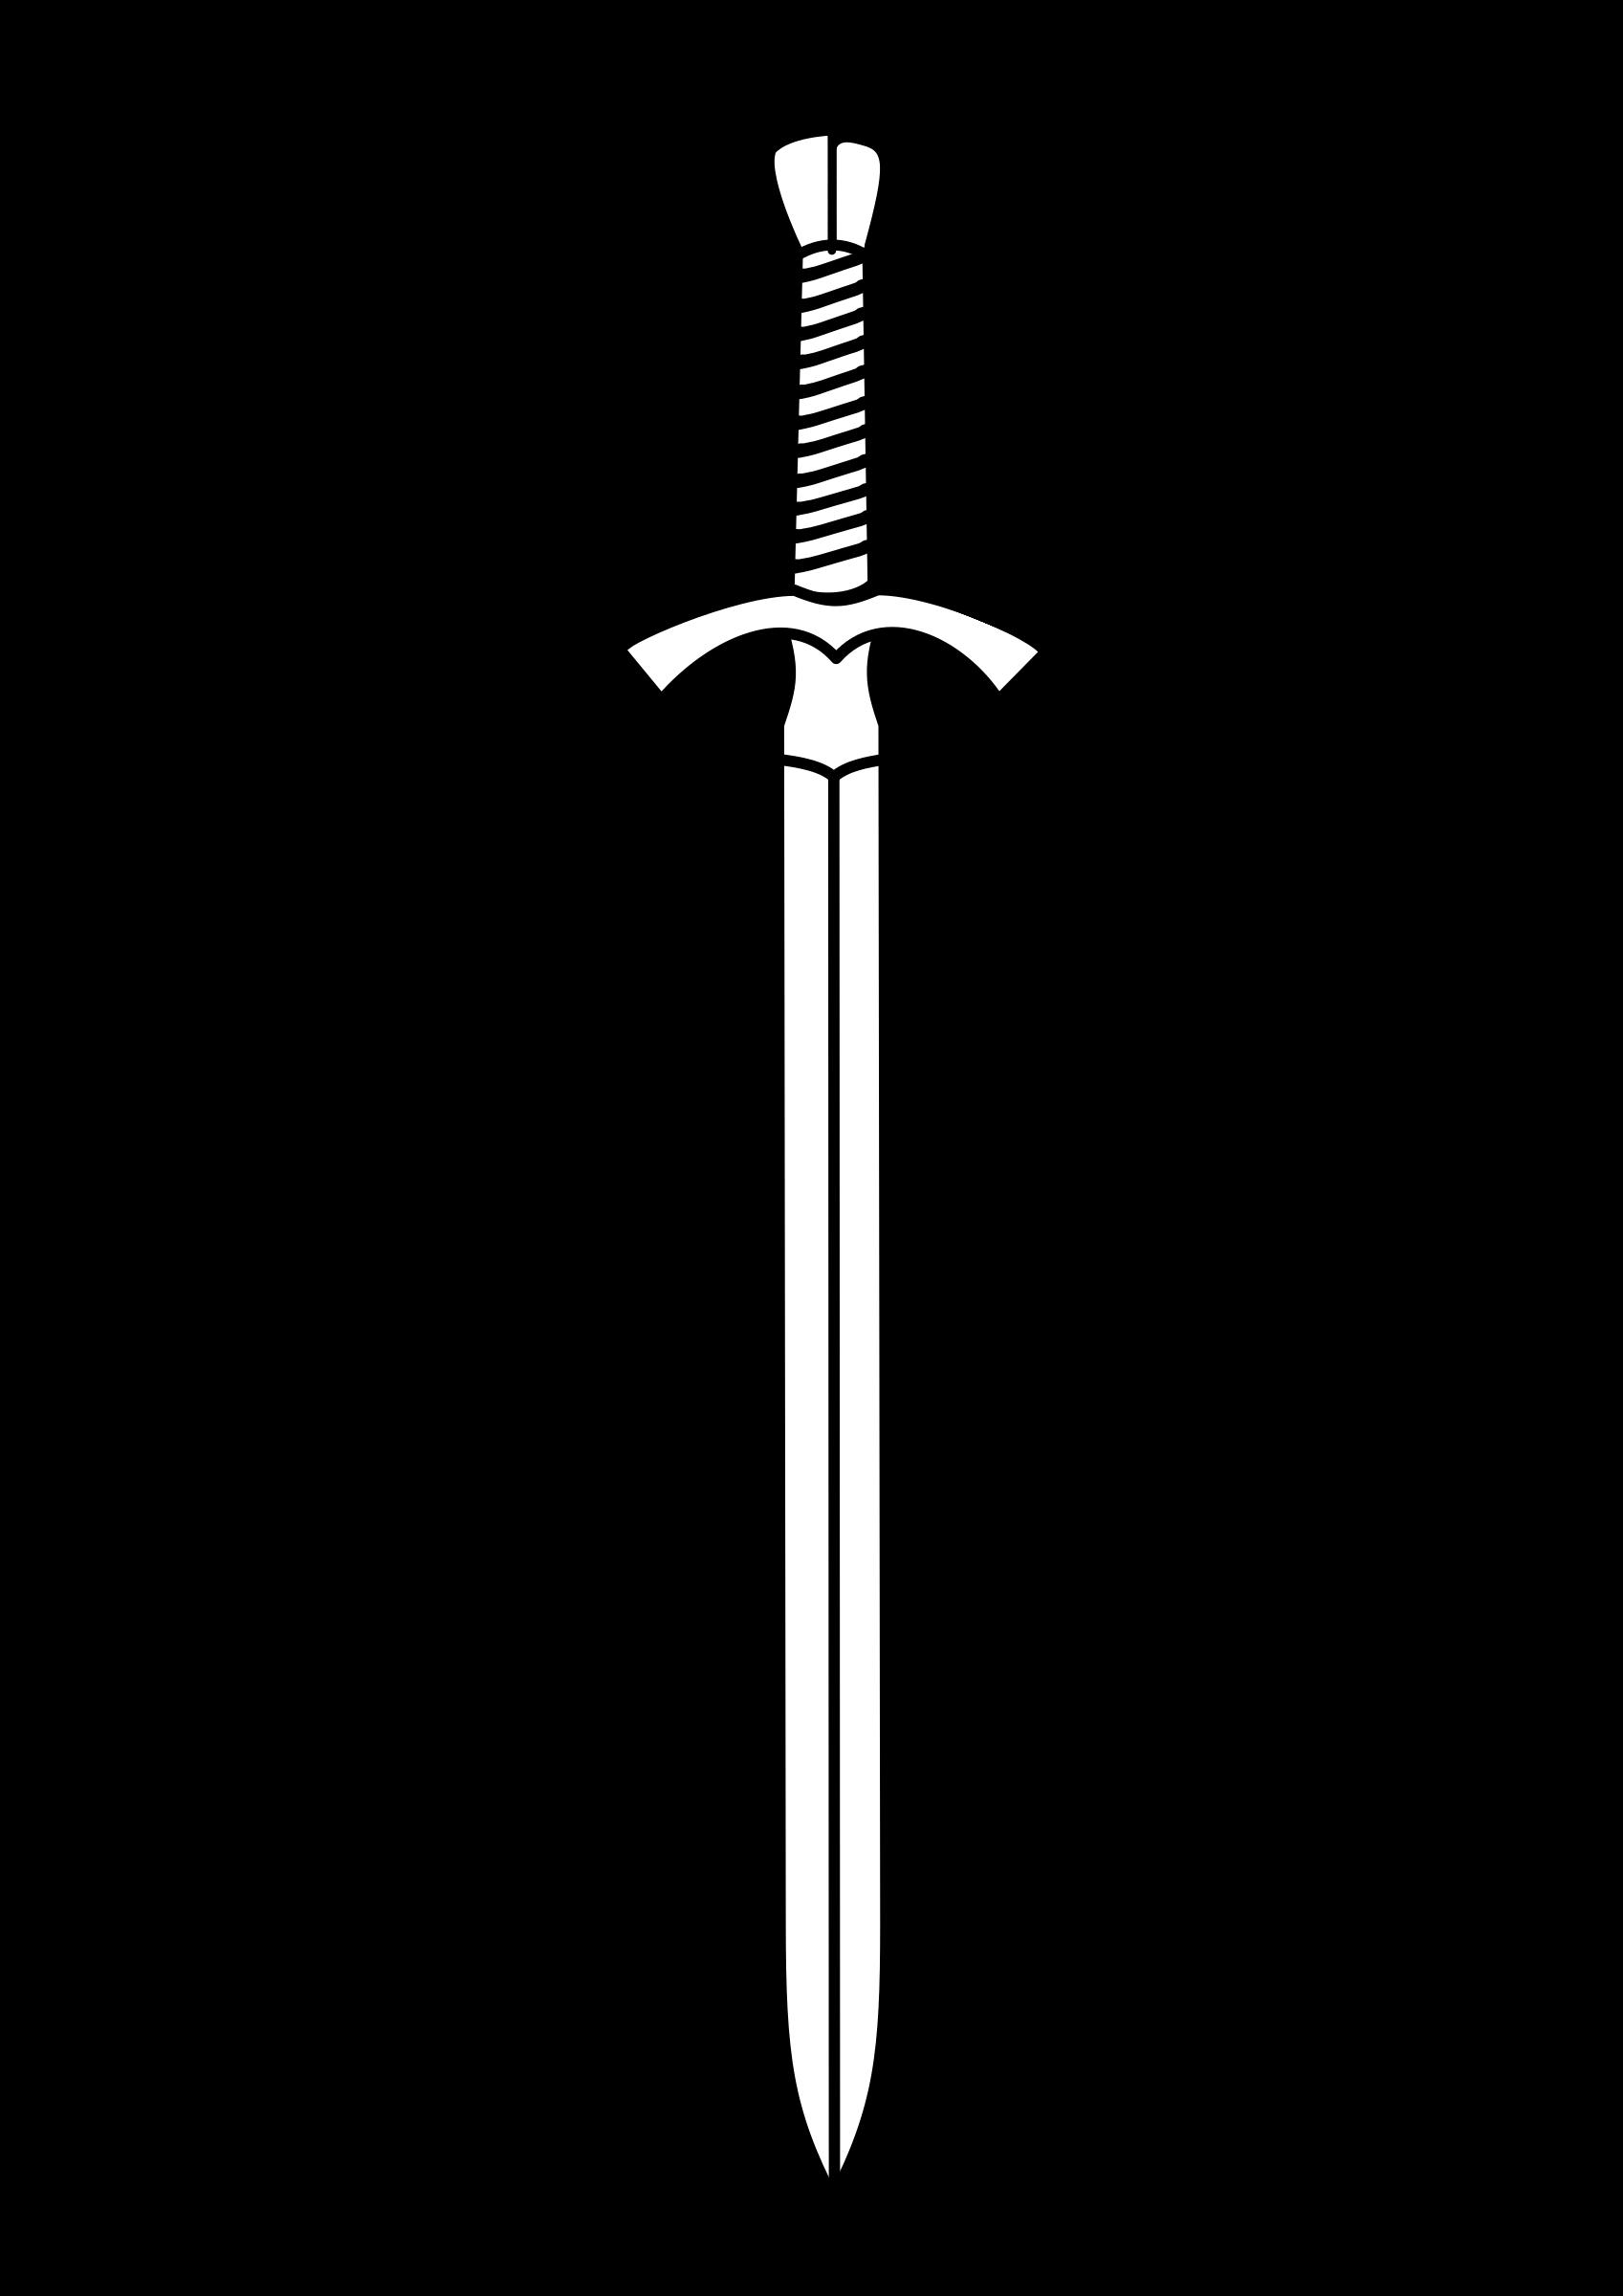 Double edged sword clipart.